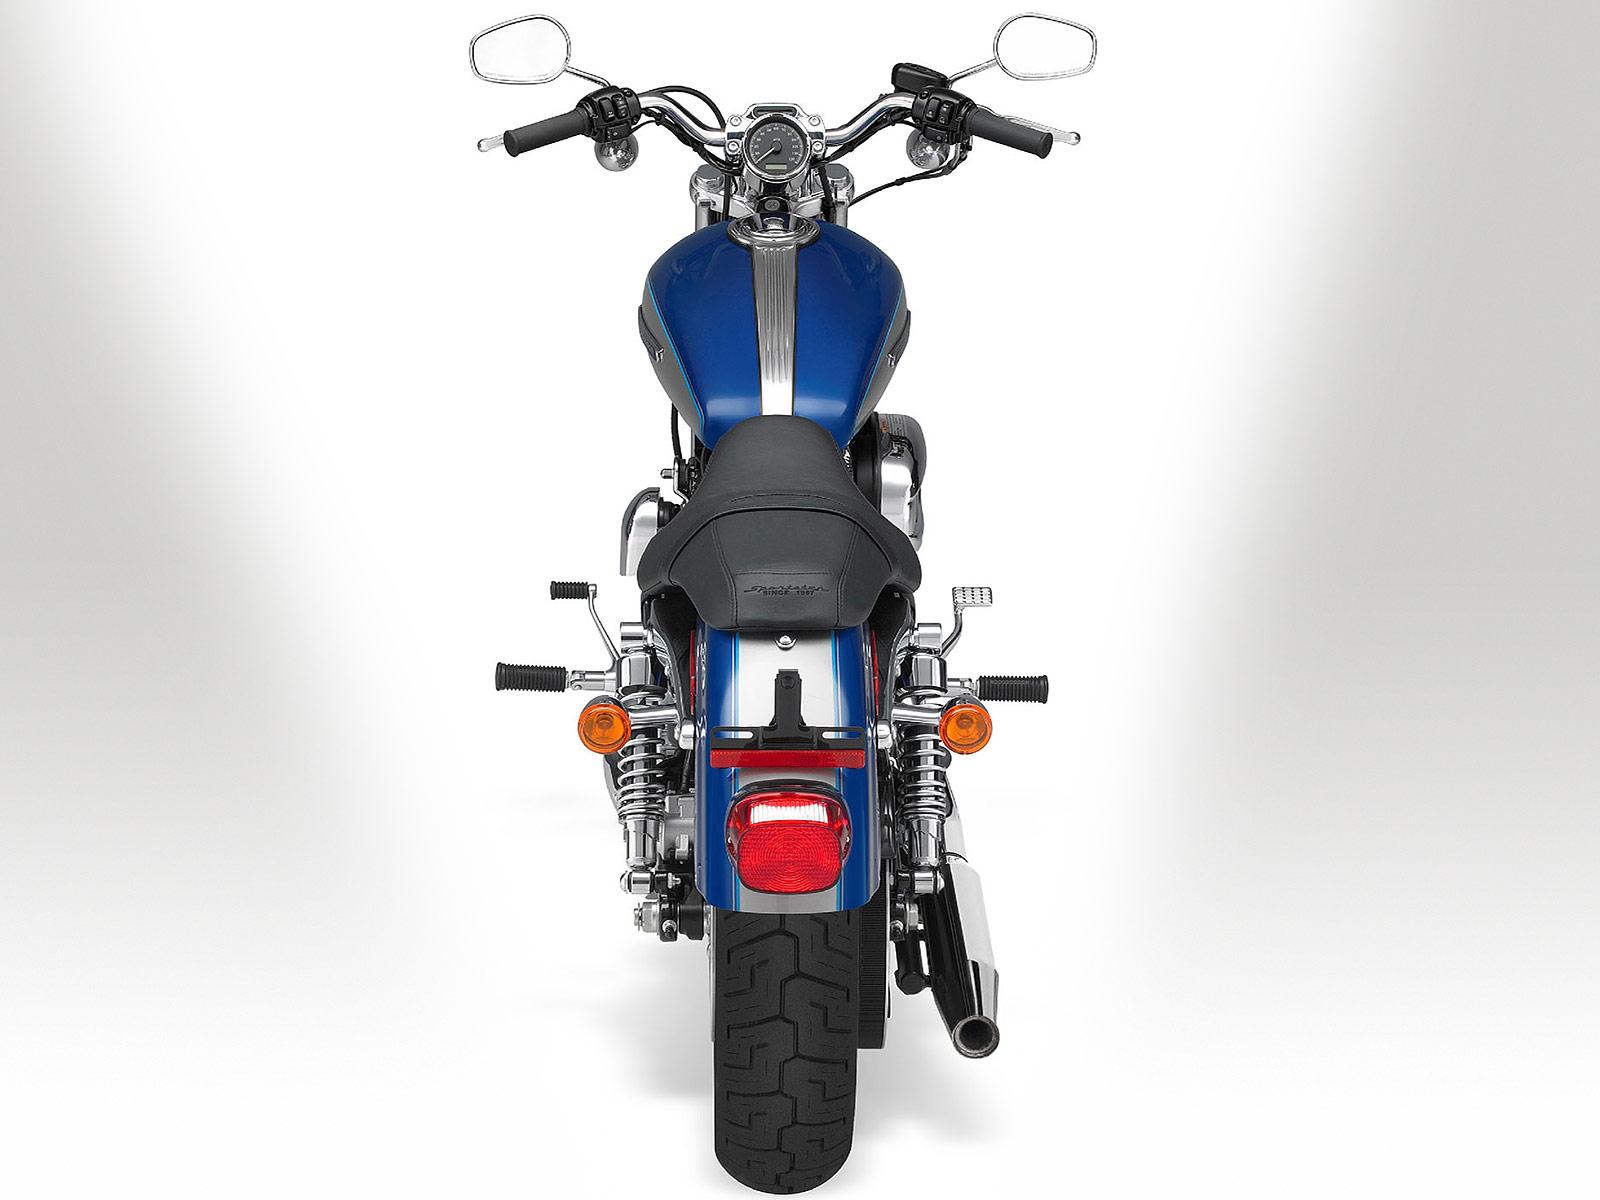 Harley Davidson: 2010 Harley-Davidson XL1200C Sportster 1200 Custom